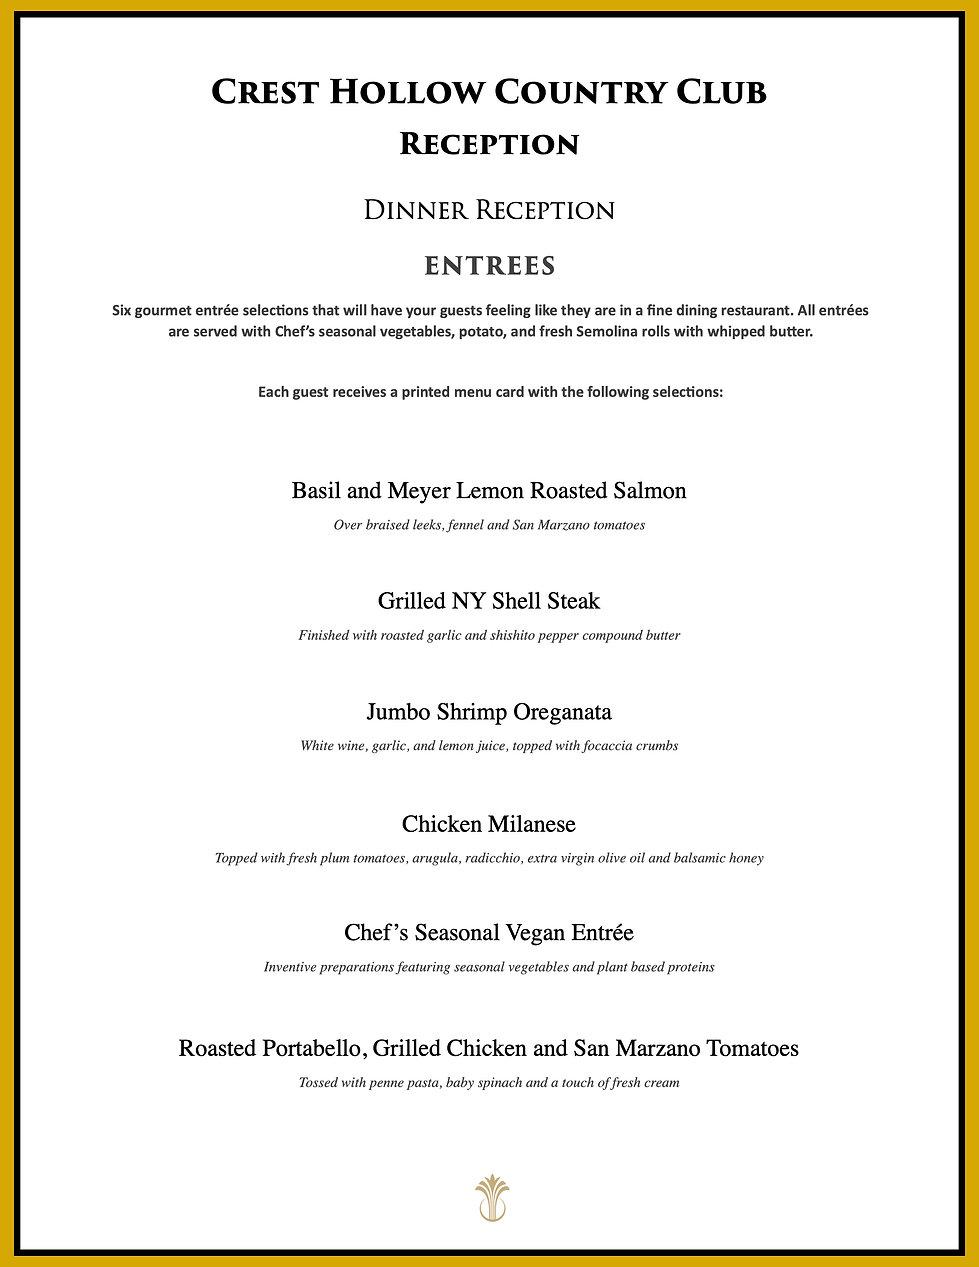 Reception Menu - Page 10.jpg